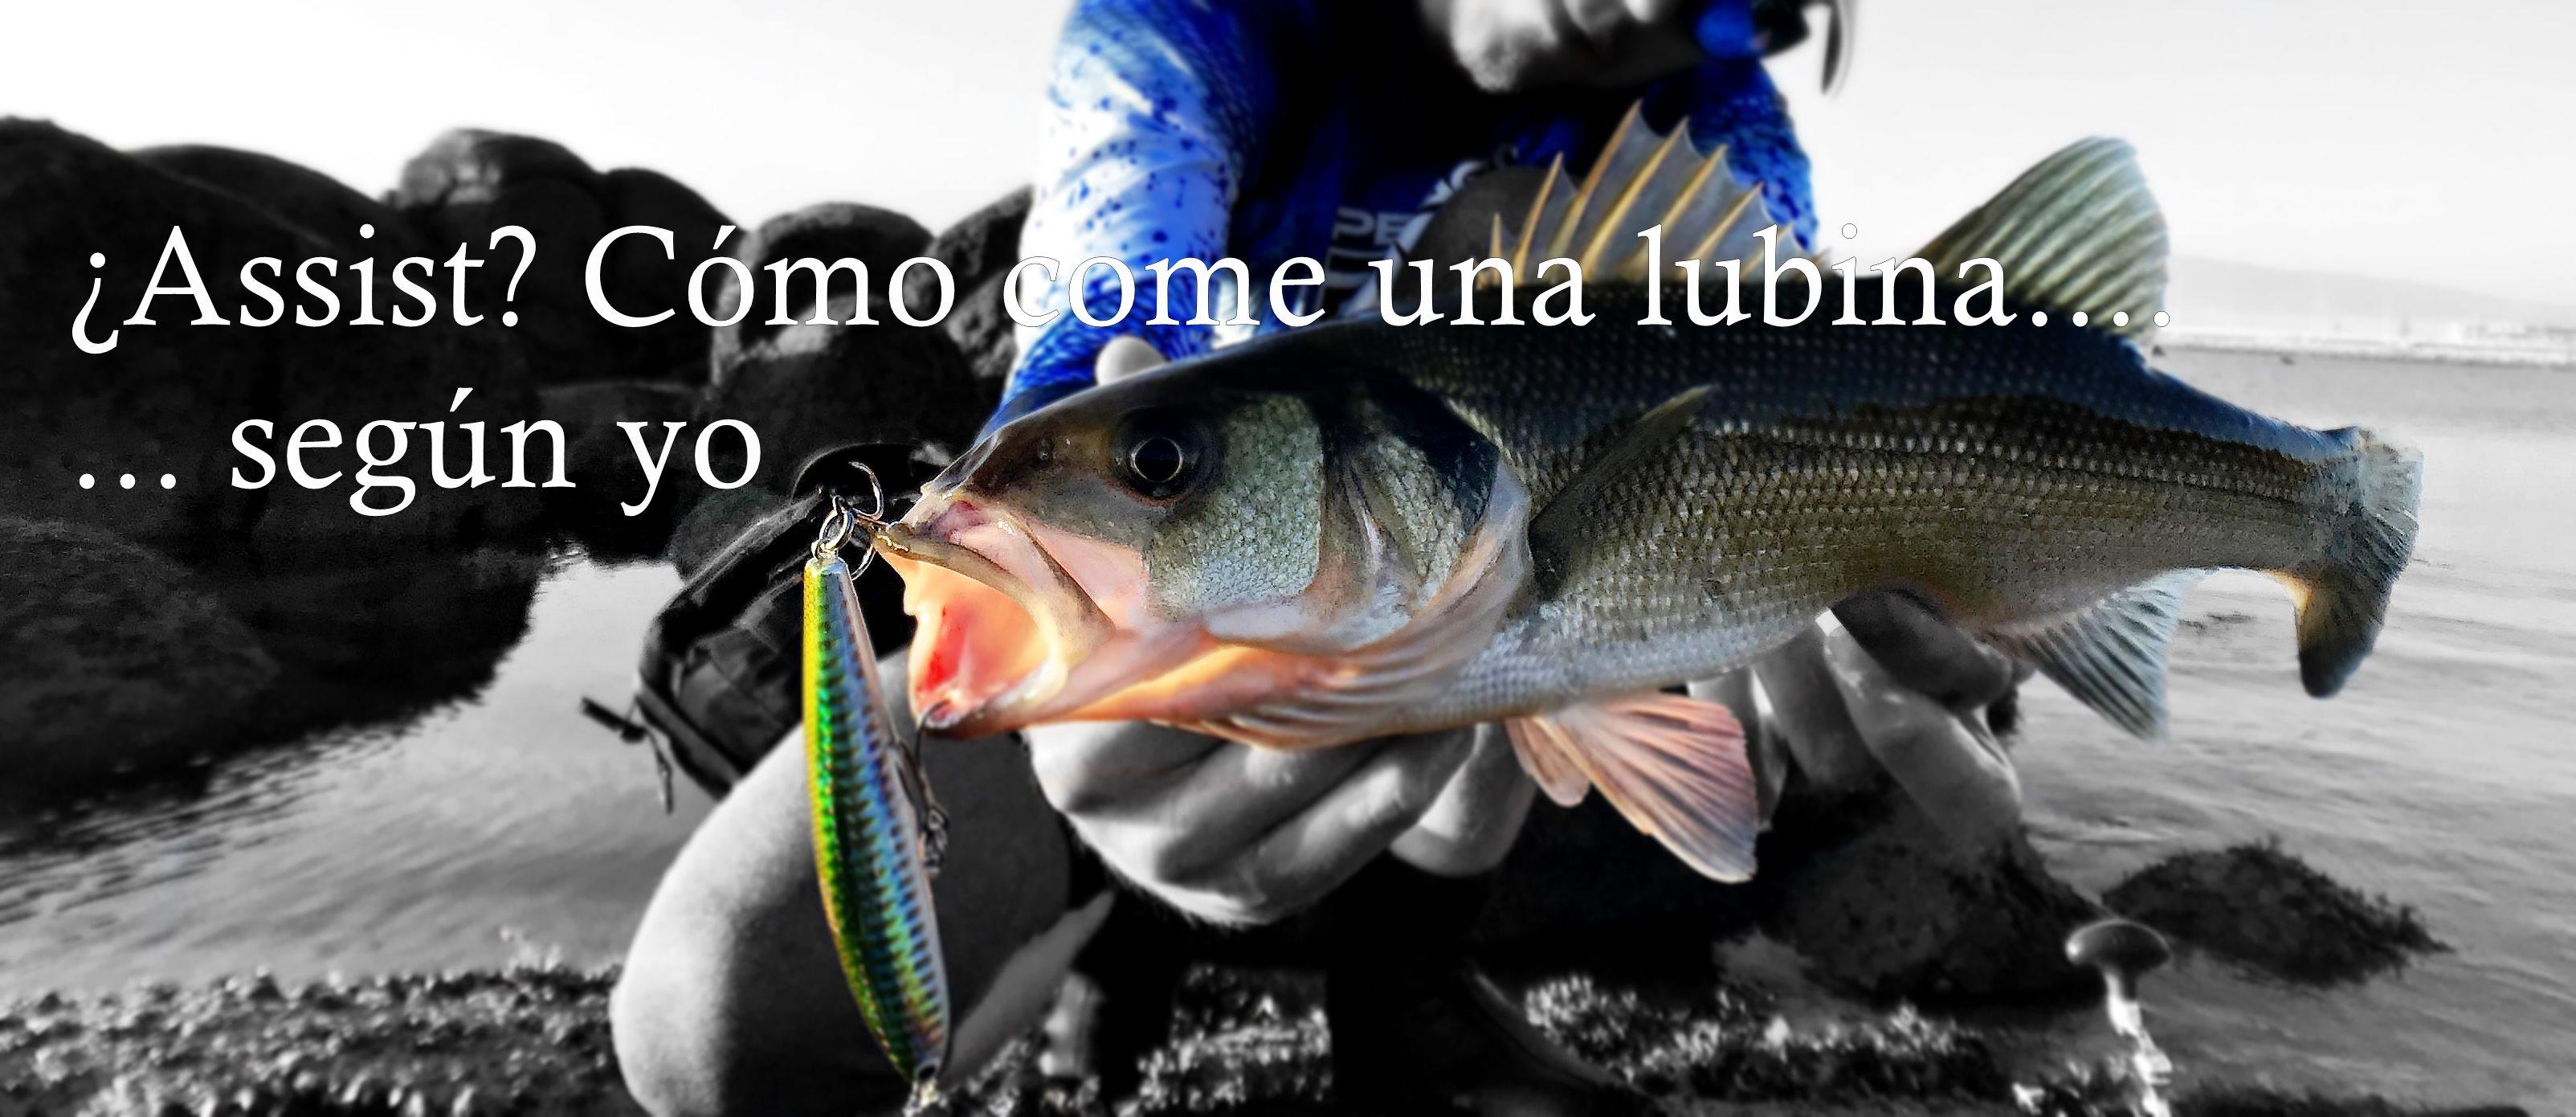 LIMMC Cebo Suave para Vinilo de Pesca de lubina de Trucha salm/ón a 5.5 Pulgadas 14 cm Trajes de ba/ño 4 pcs//Lot Se/ñuelos de Pesca Cebo